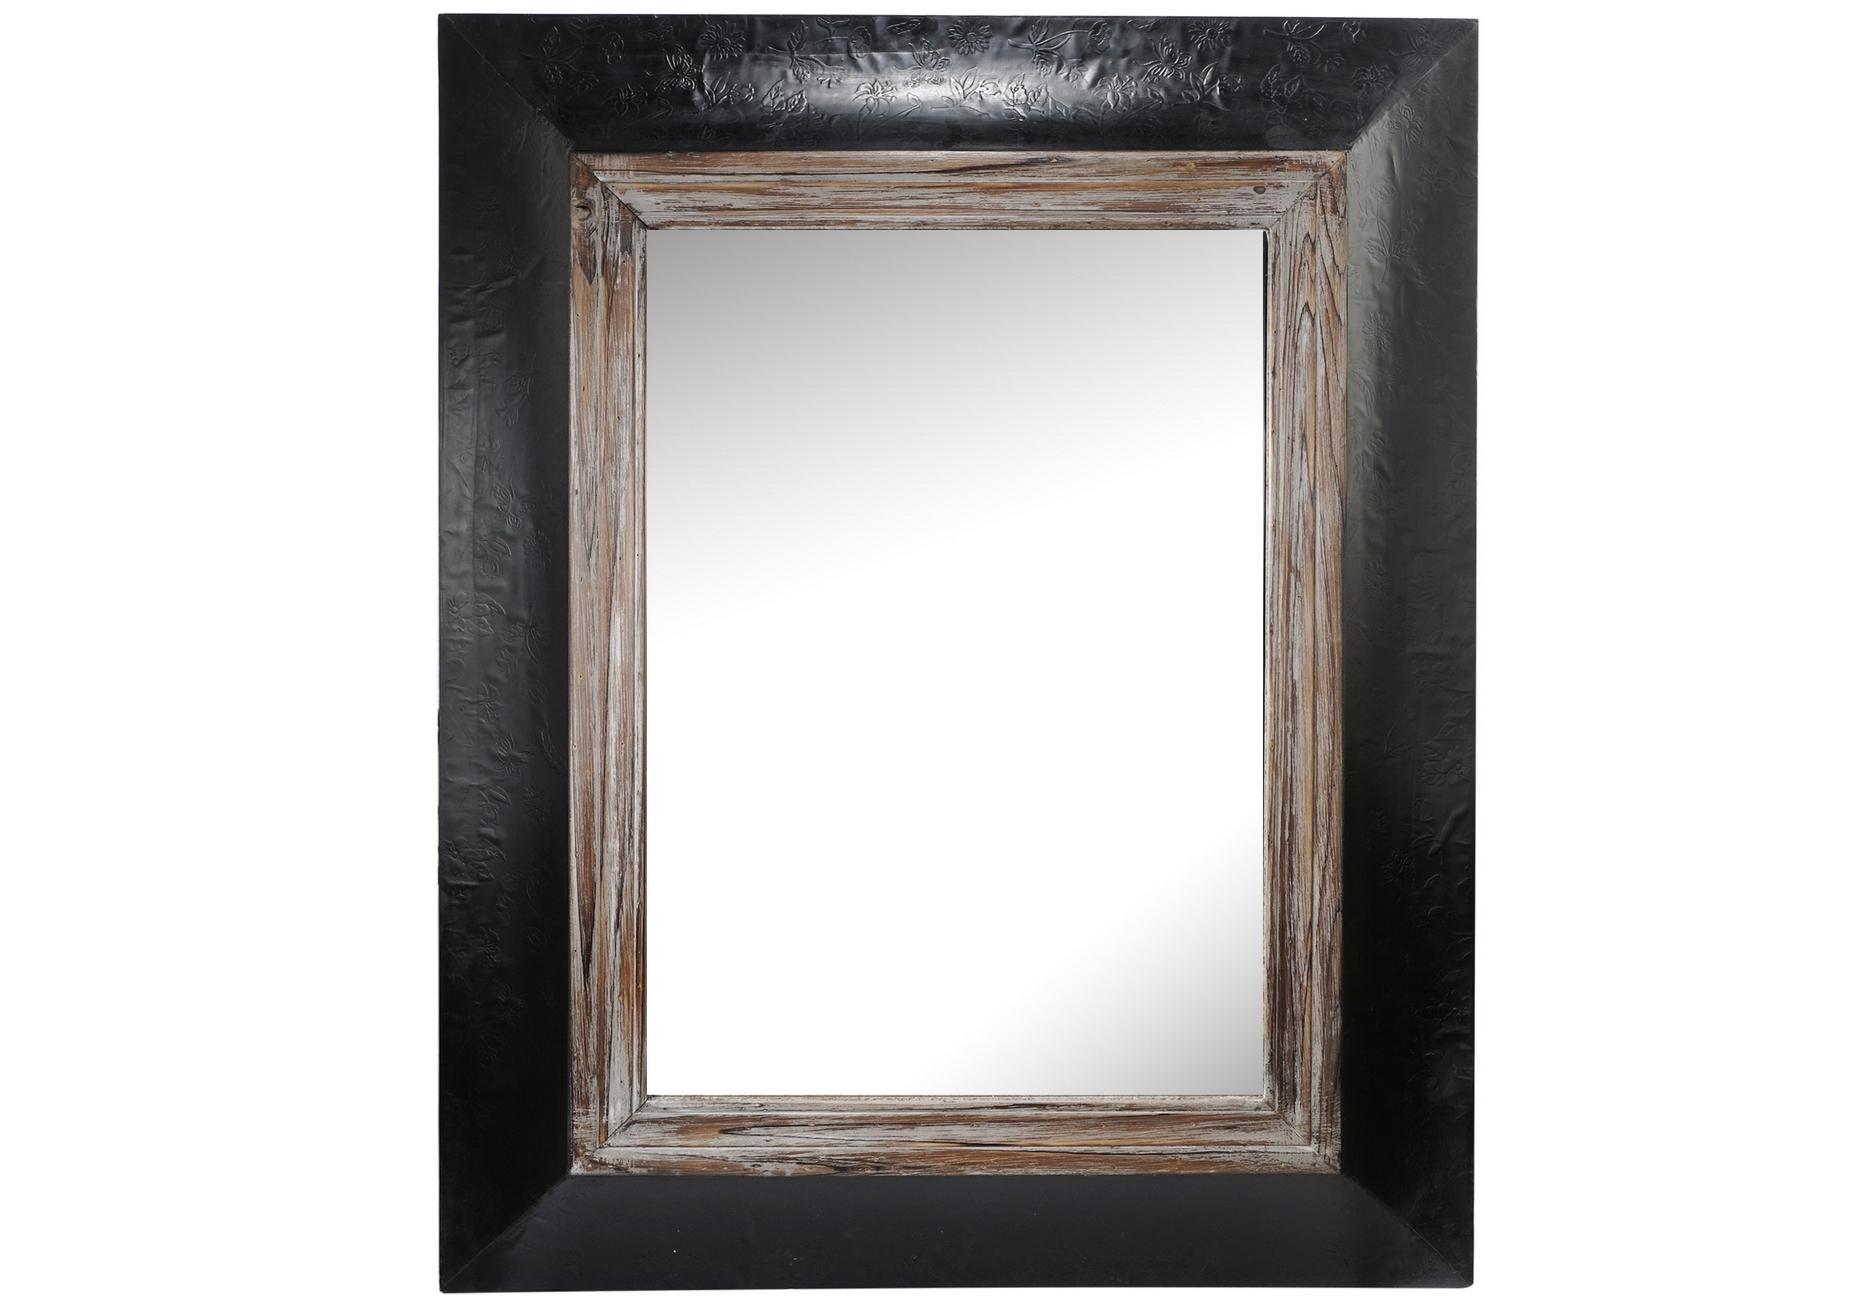 Зеркало настенноеНастенные зеркала<br>Вес 11 кг.<br><br>Material: Металл<br>Width см: 82<br>Depth см: 8<br>Height см: 100